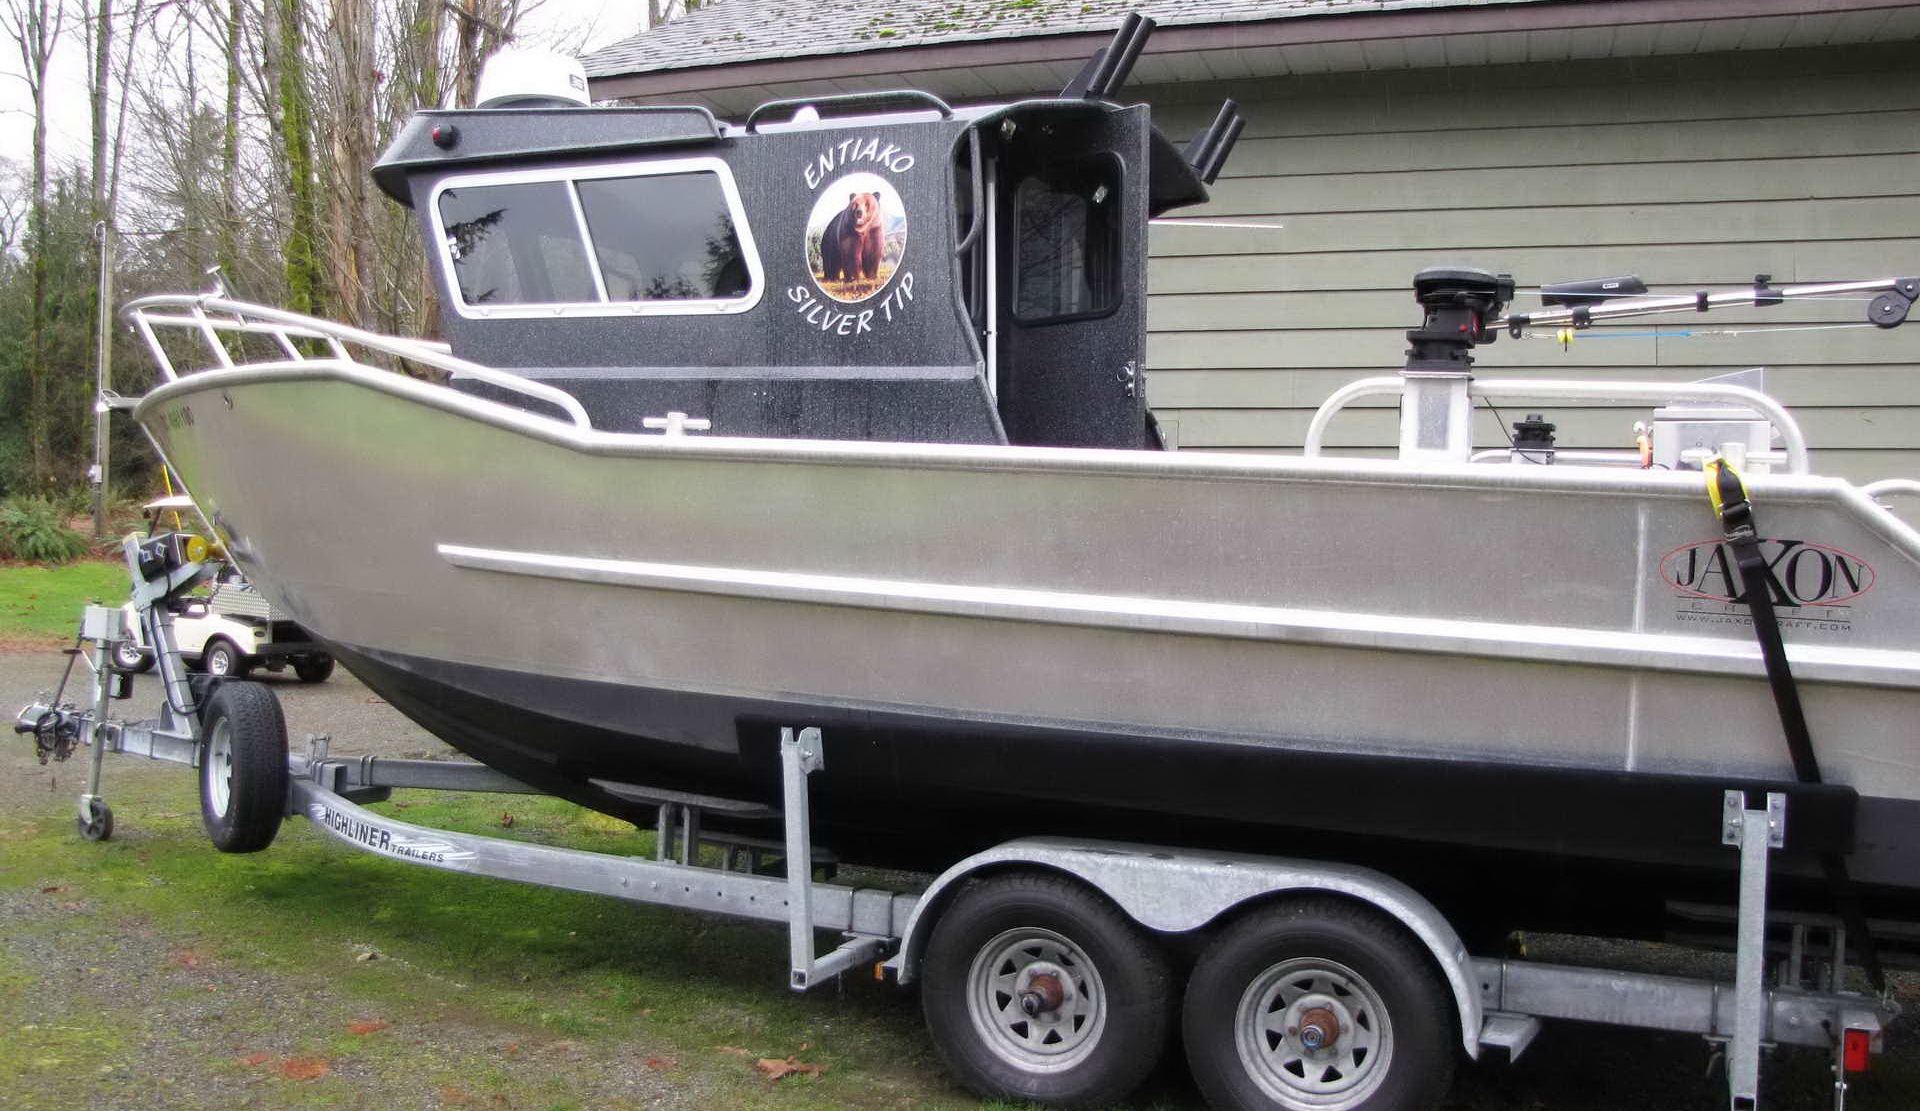 Jaxon Craft 27 Guide Dive Sport Fishing Boat